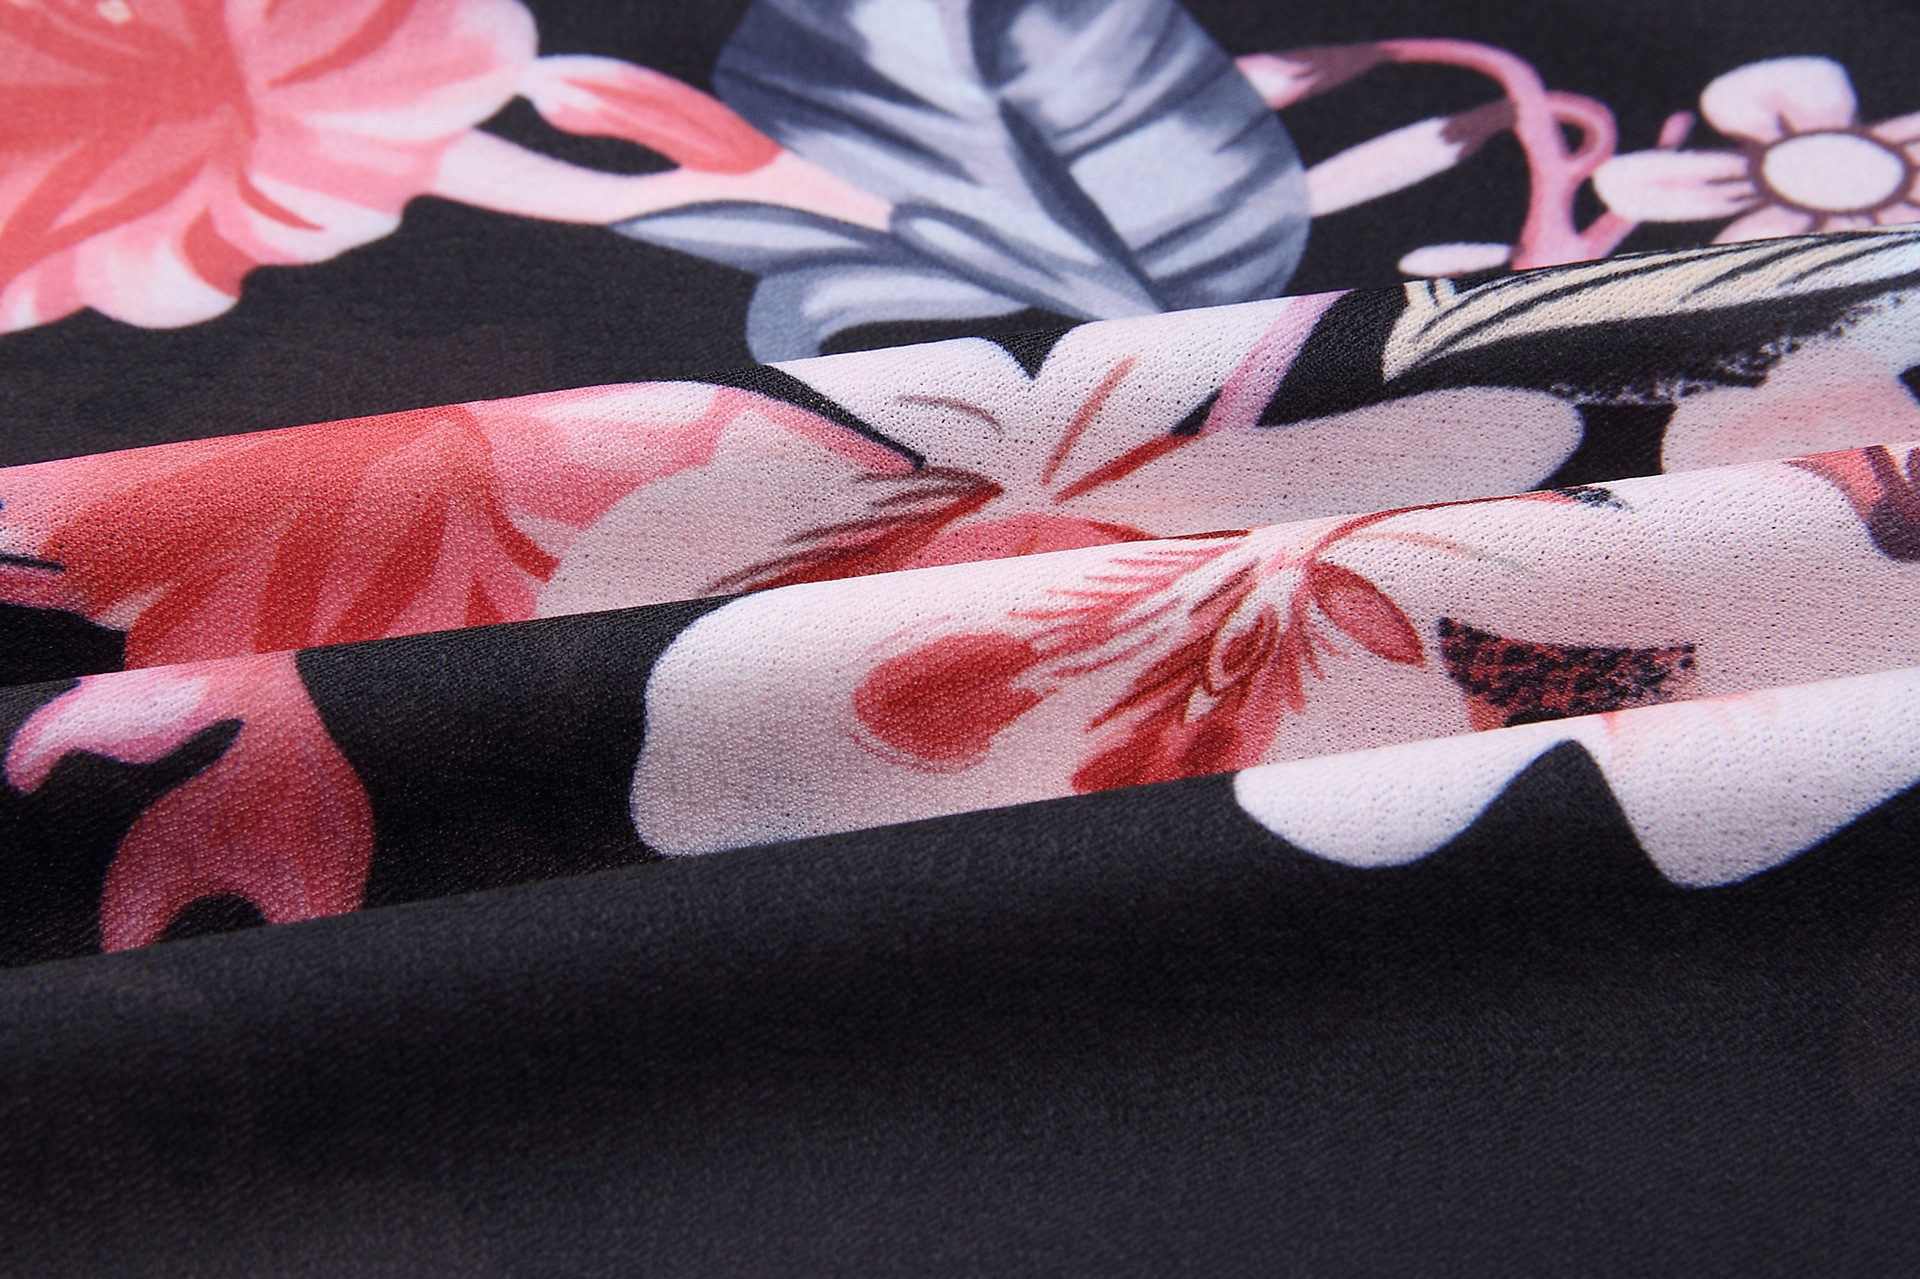 2018 Summer Dress Women Print V Neck Short Sleeve Robe Female Dresses Casual Sashes Midi Dress Ladies Elegant Vestidos Dropship 25